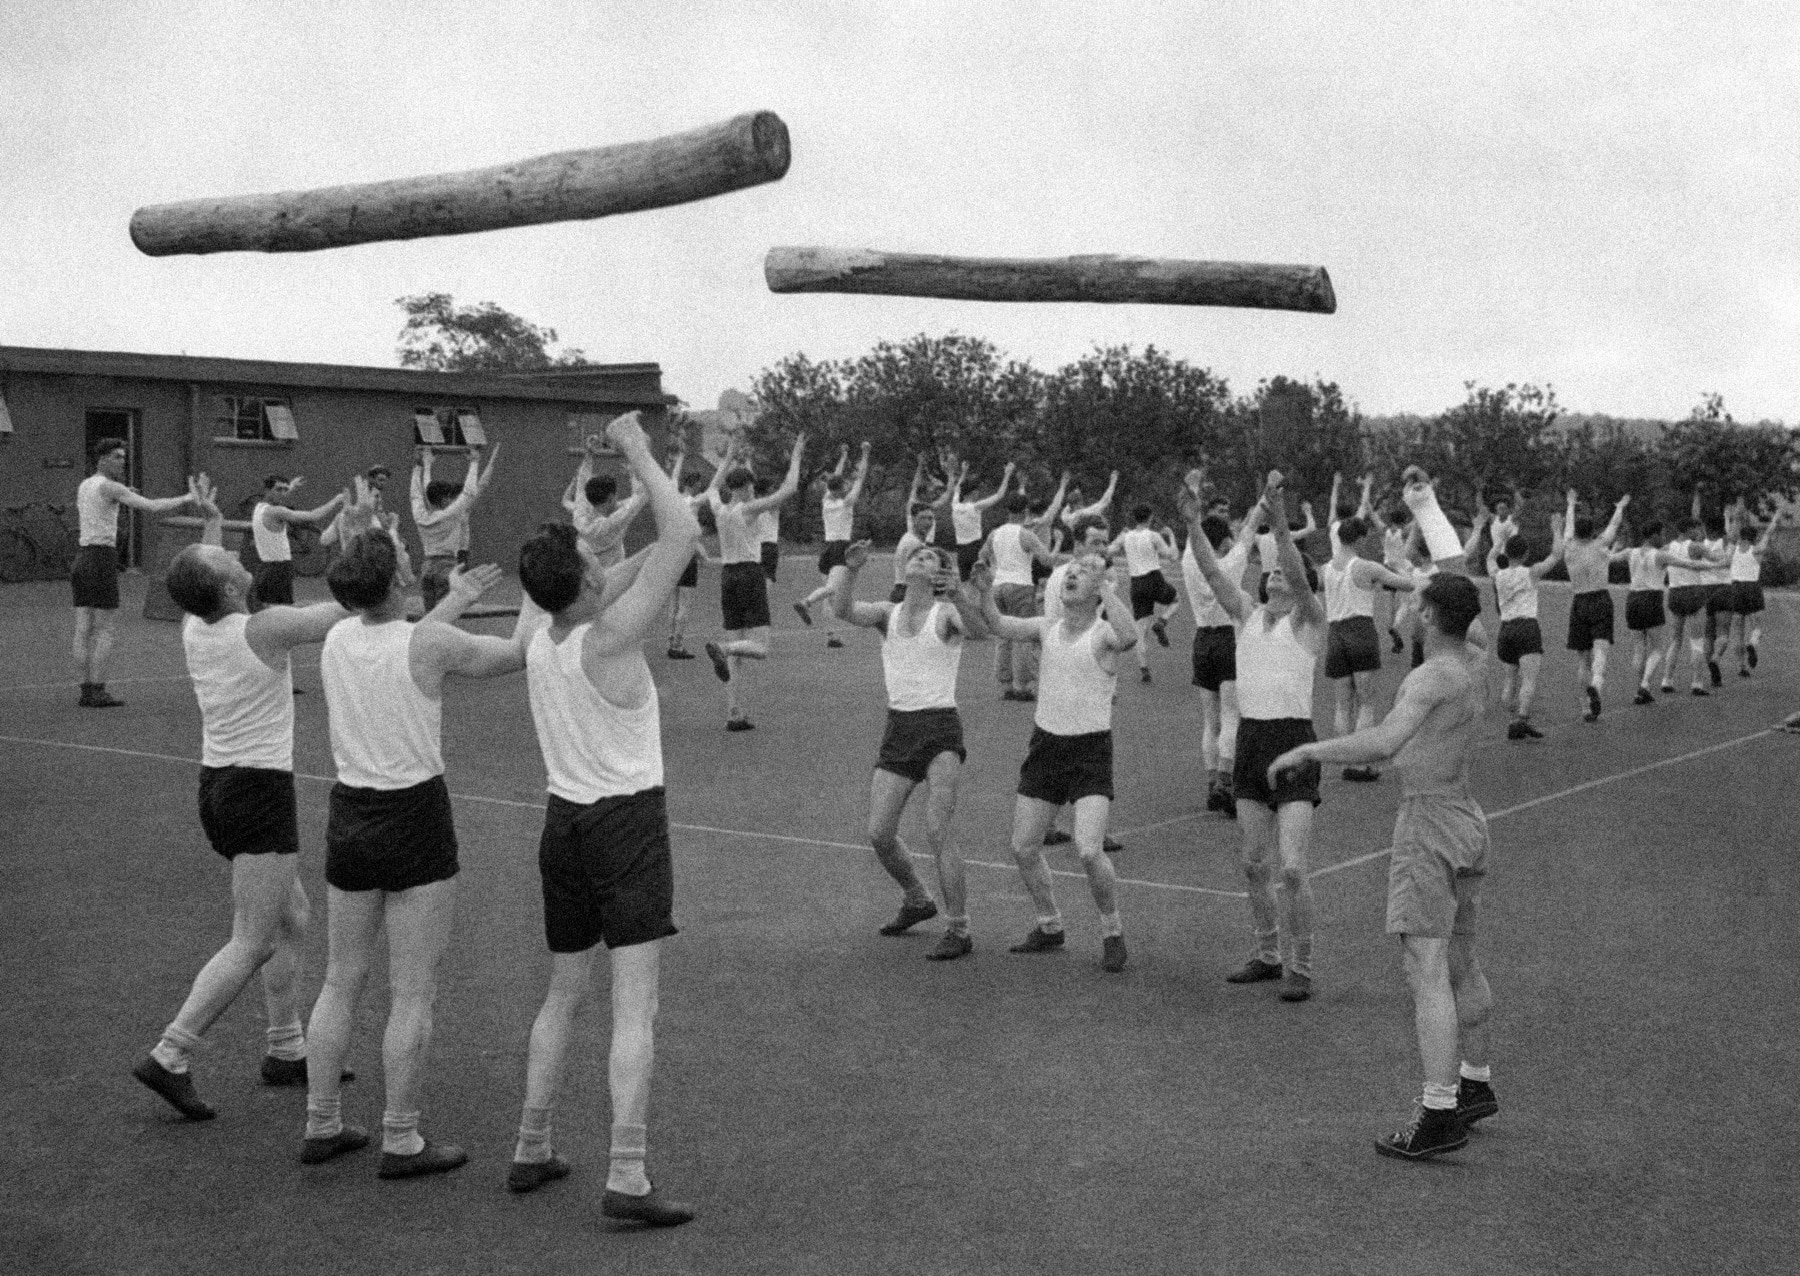 Rows of men tossing logs in air (© AP Images)